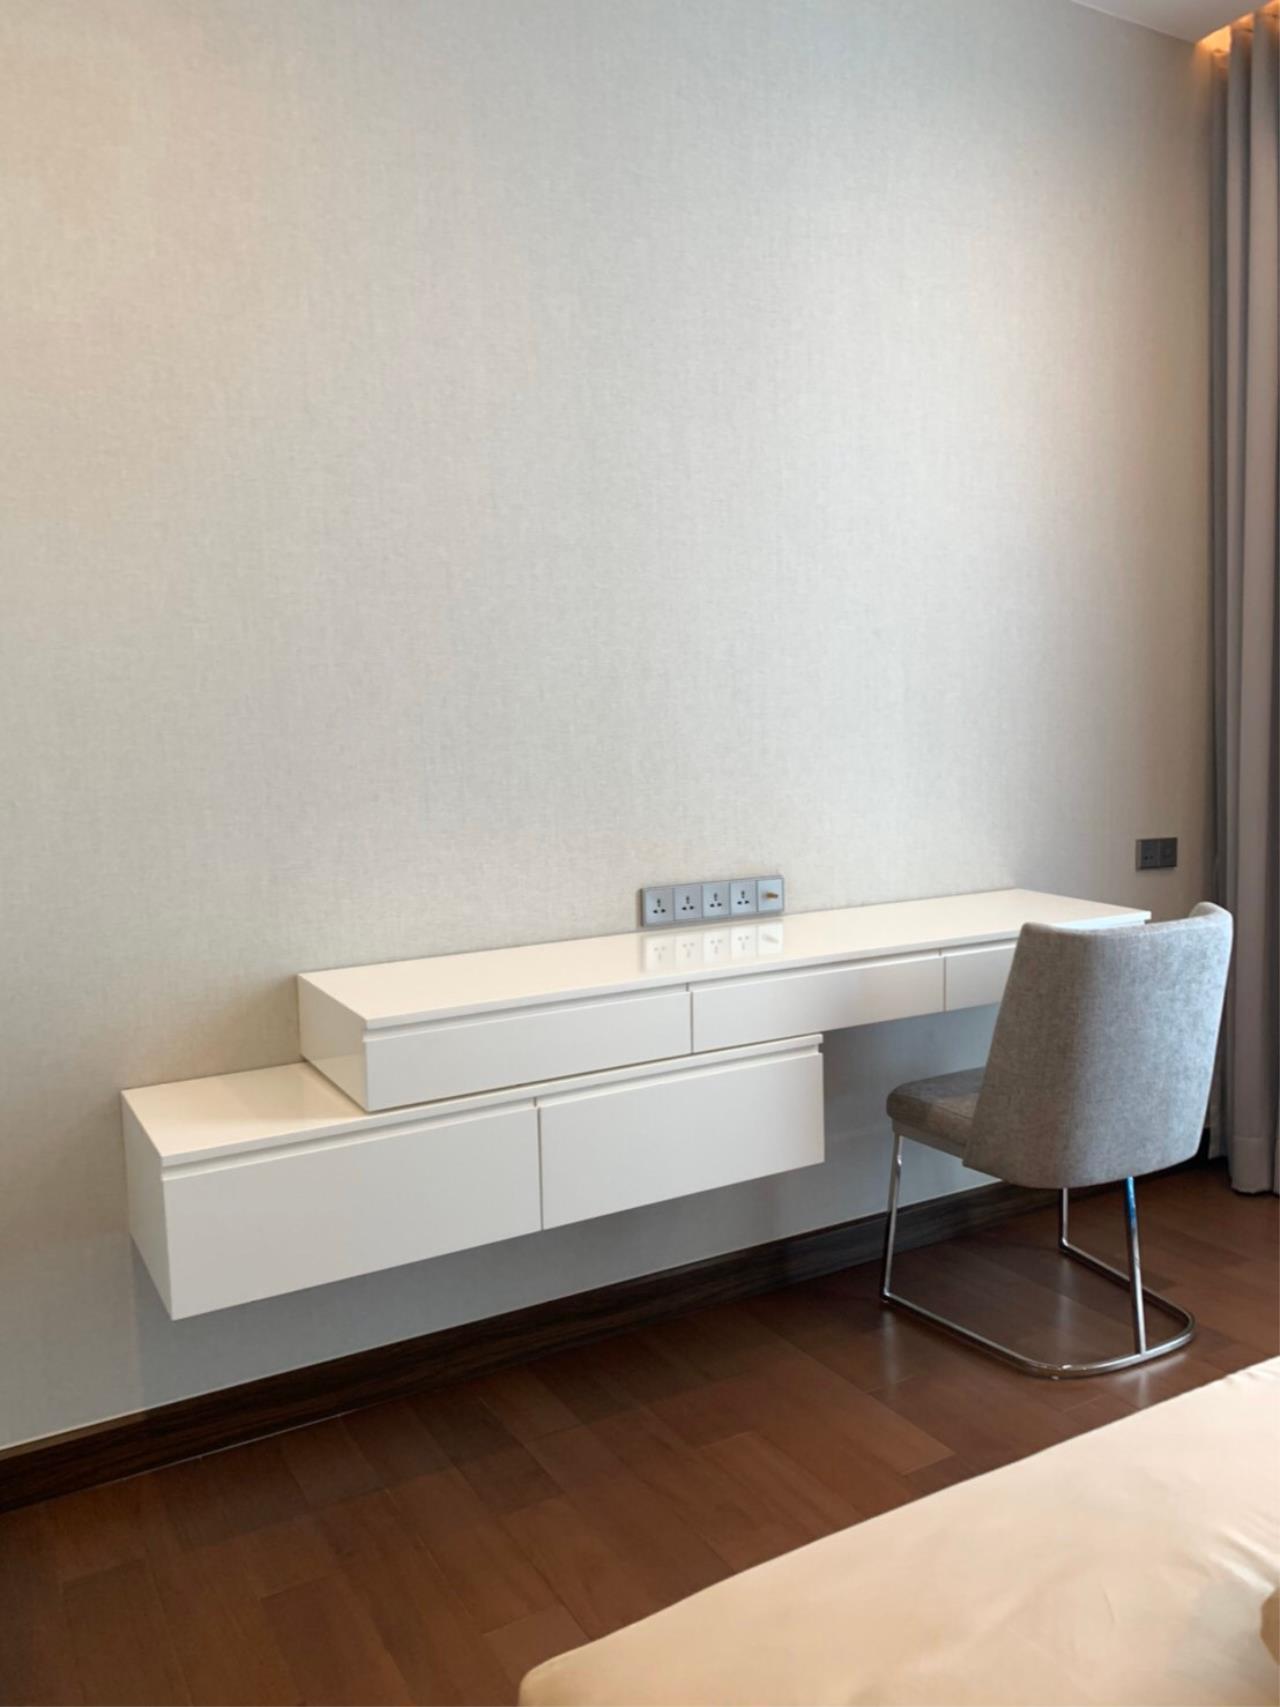 Bestbkkcondos Agency's Q sukhumvit at BTSnana - 92sqm - For Rent : 90 000 / month - 2 Bedrooms 7